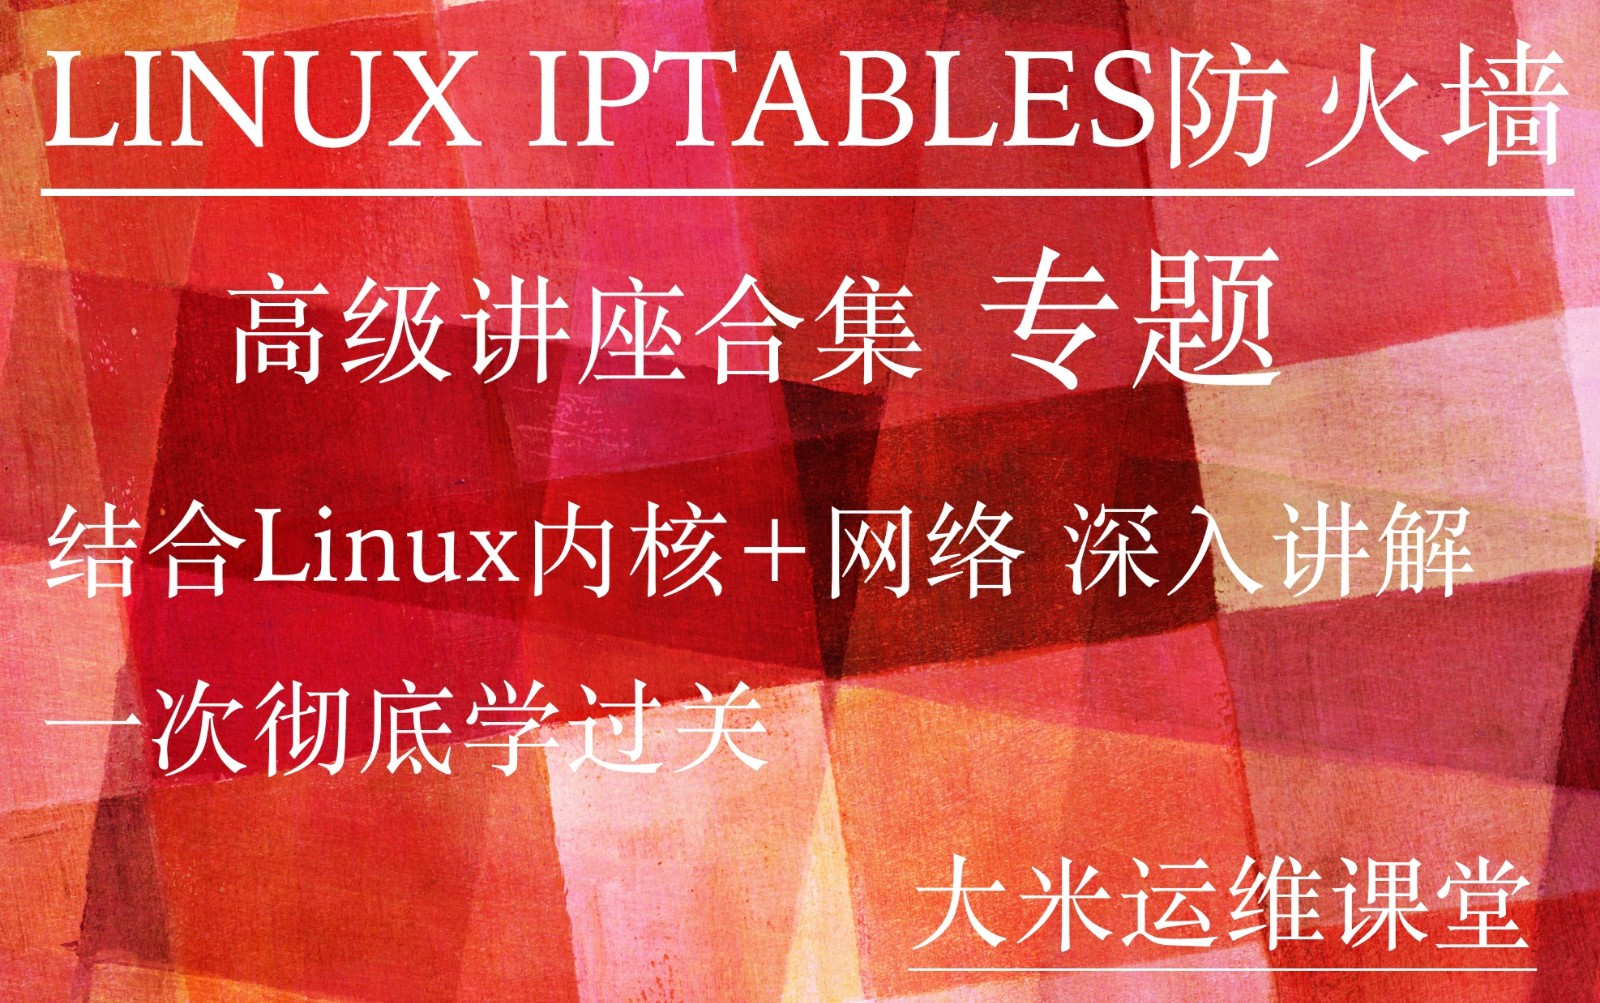 LINUX IPTABLES防火墙 高级讲座专题